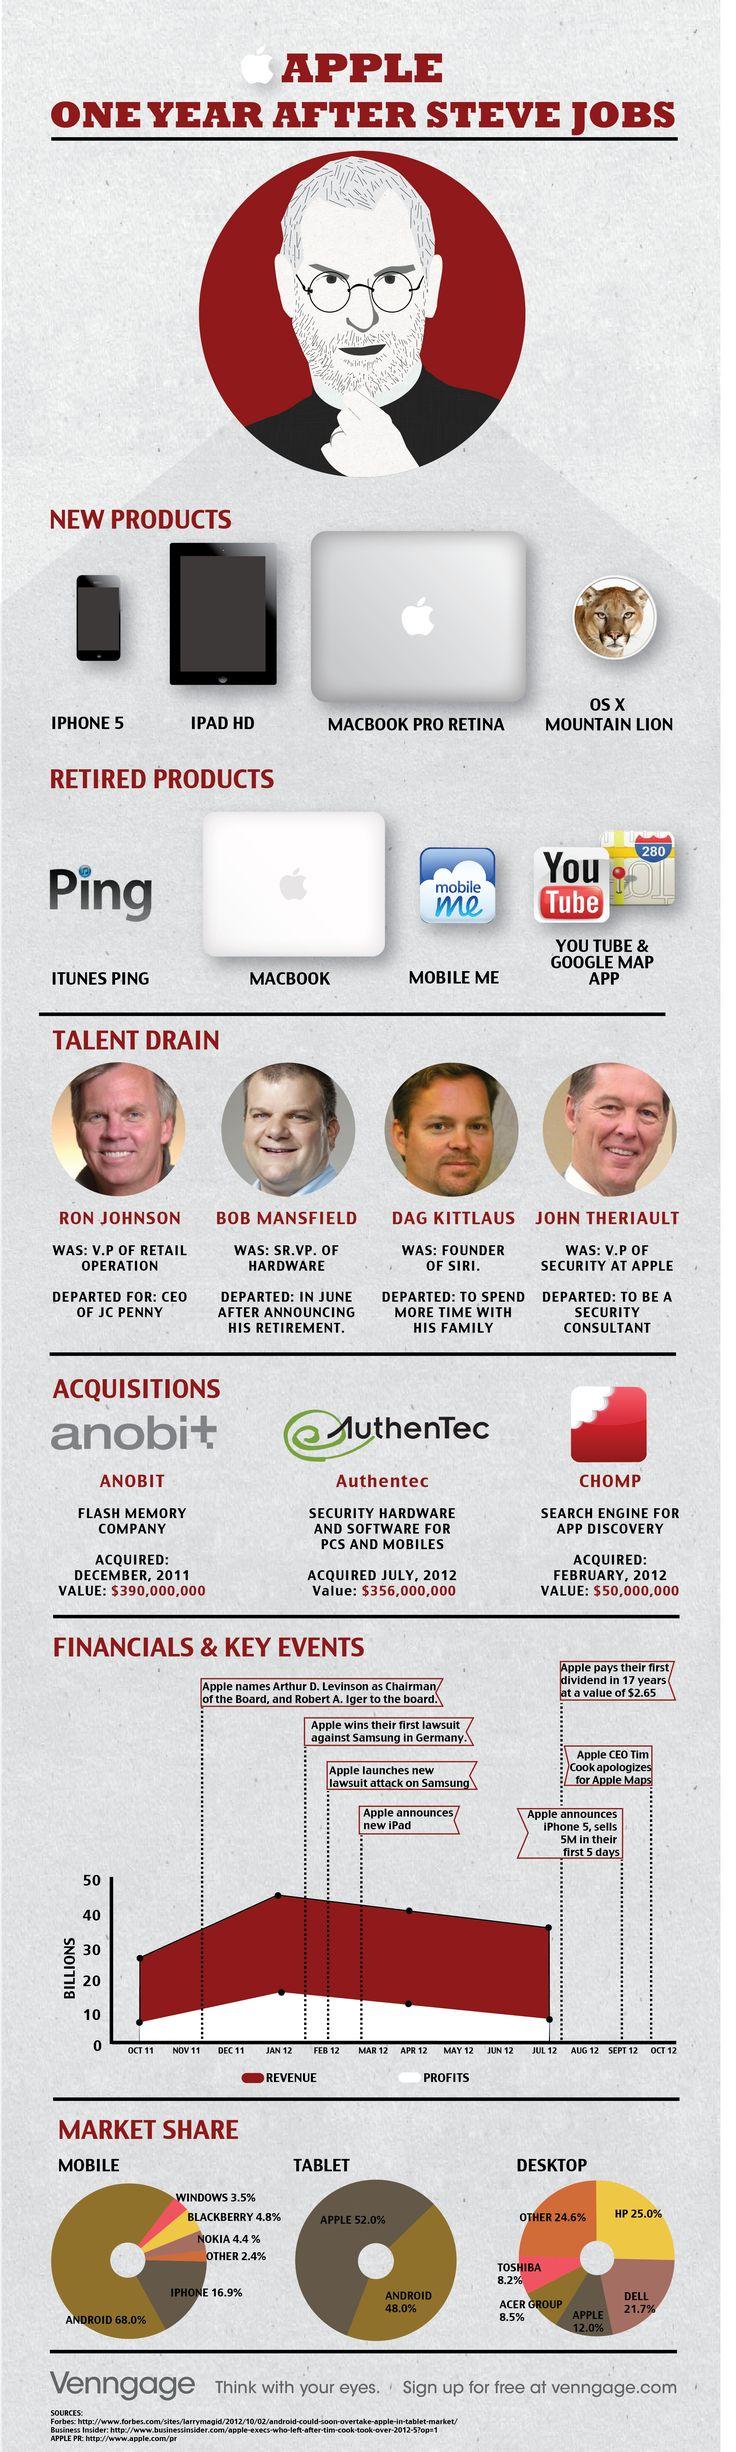 Apple 1 año después de Steve Jobs #infografia #infographic #apple